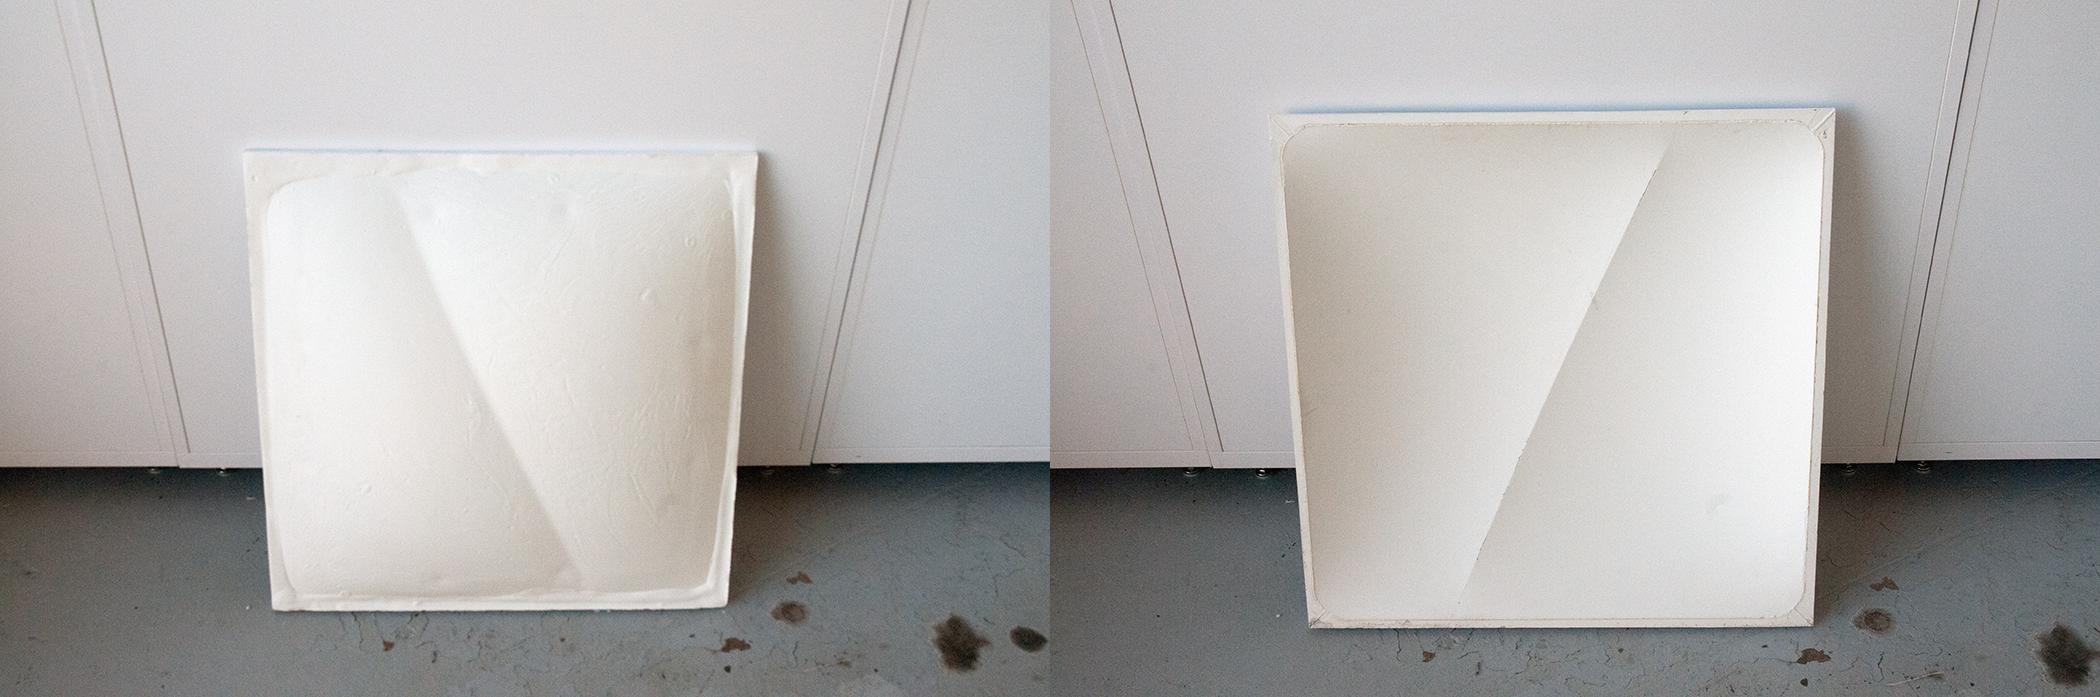 06_Morphfaux_finished tile